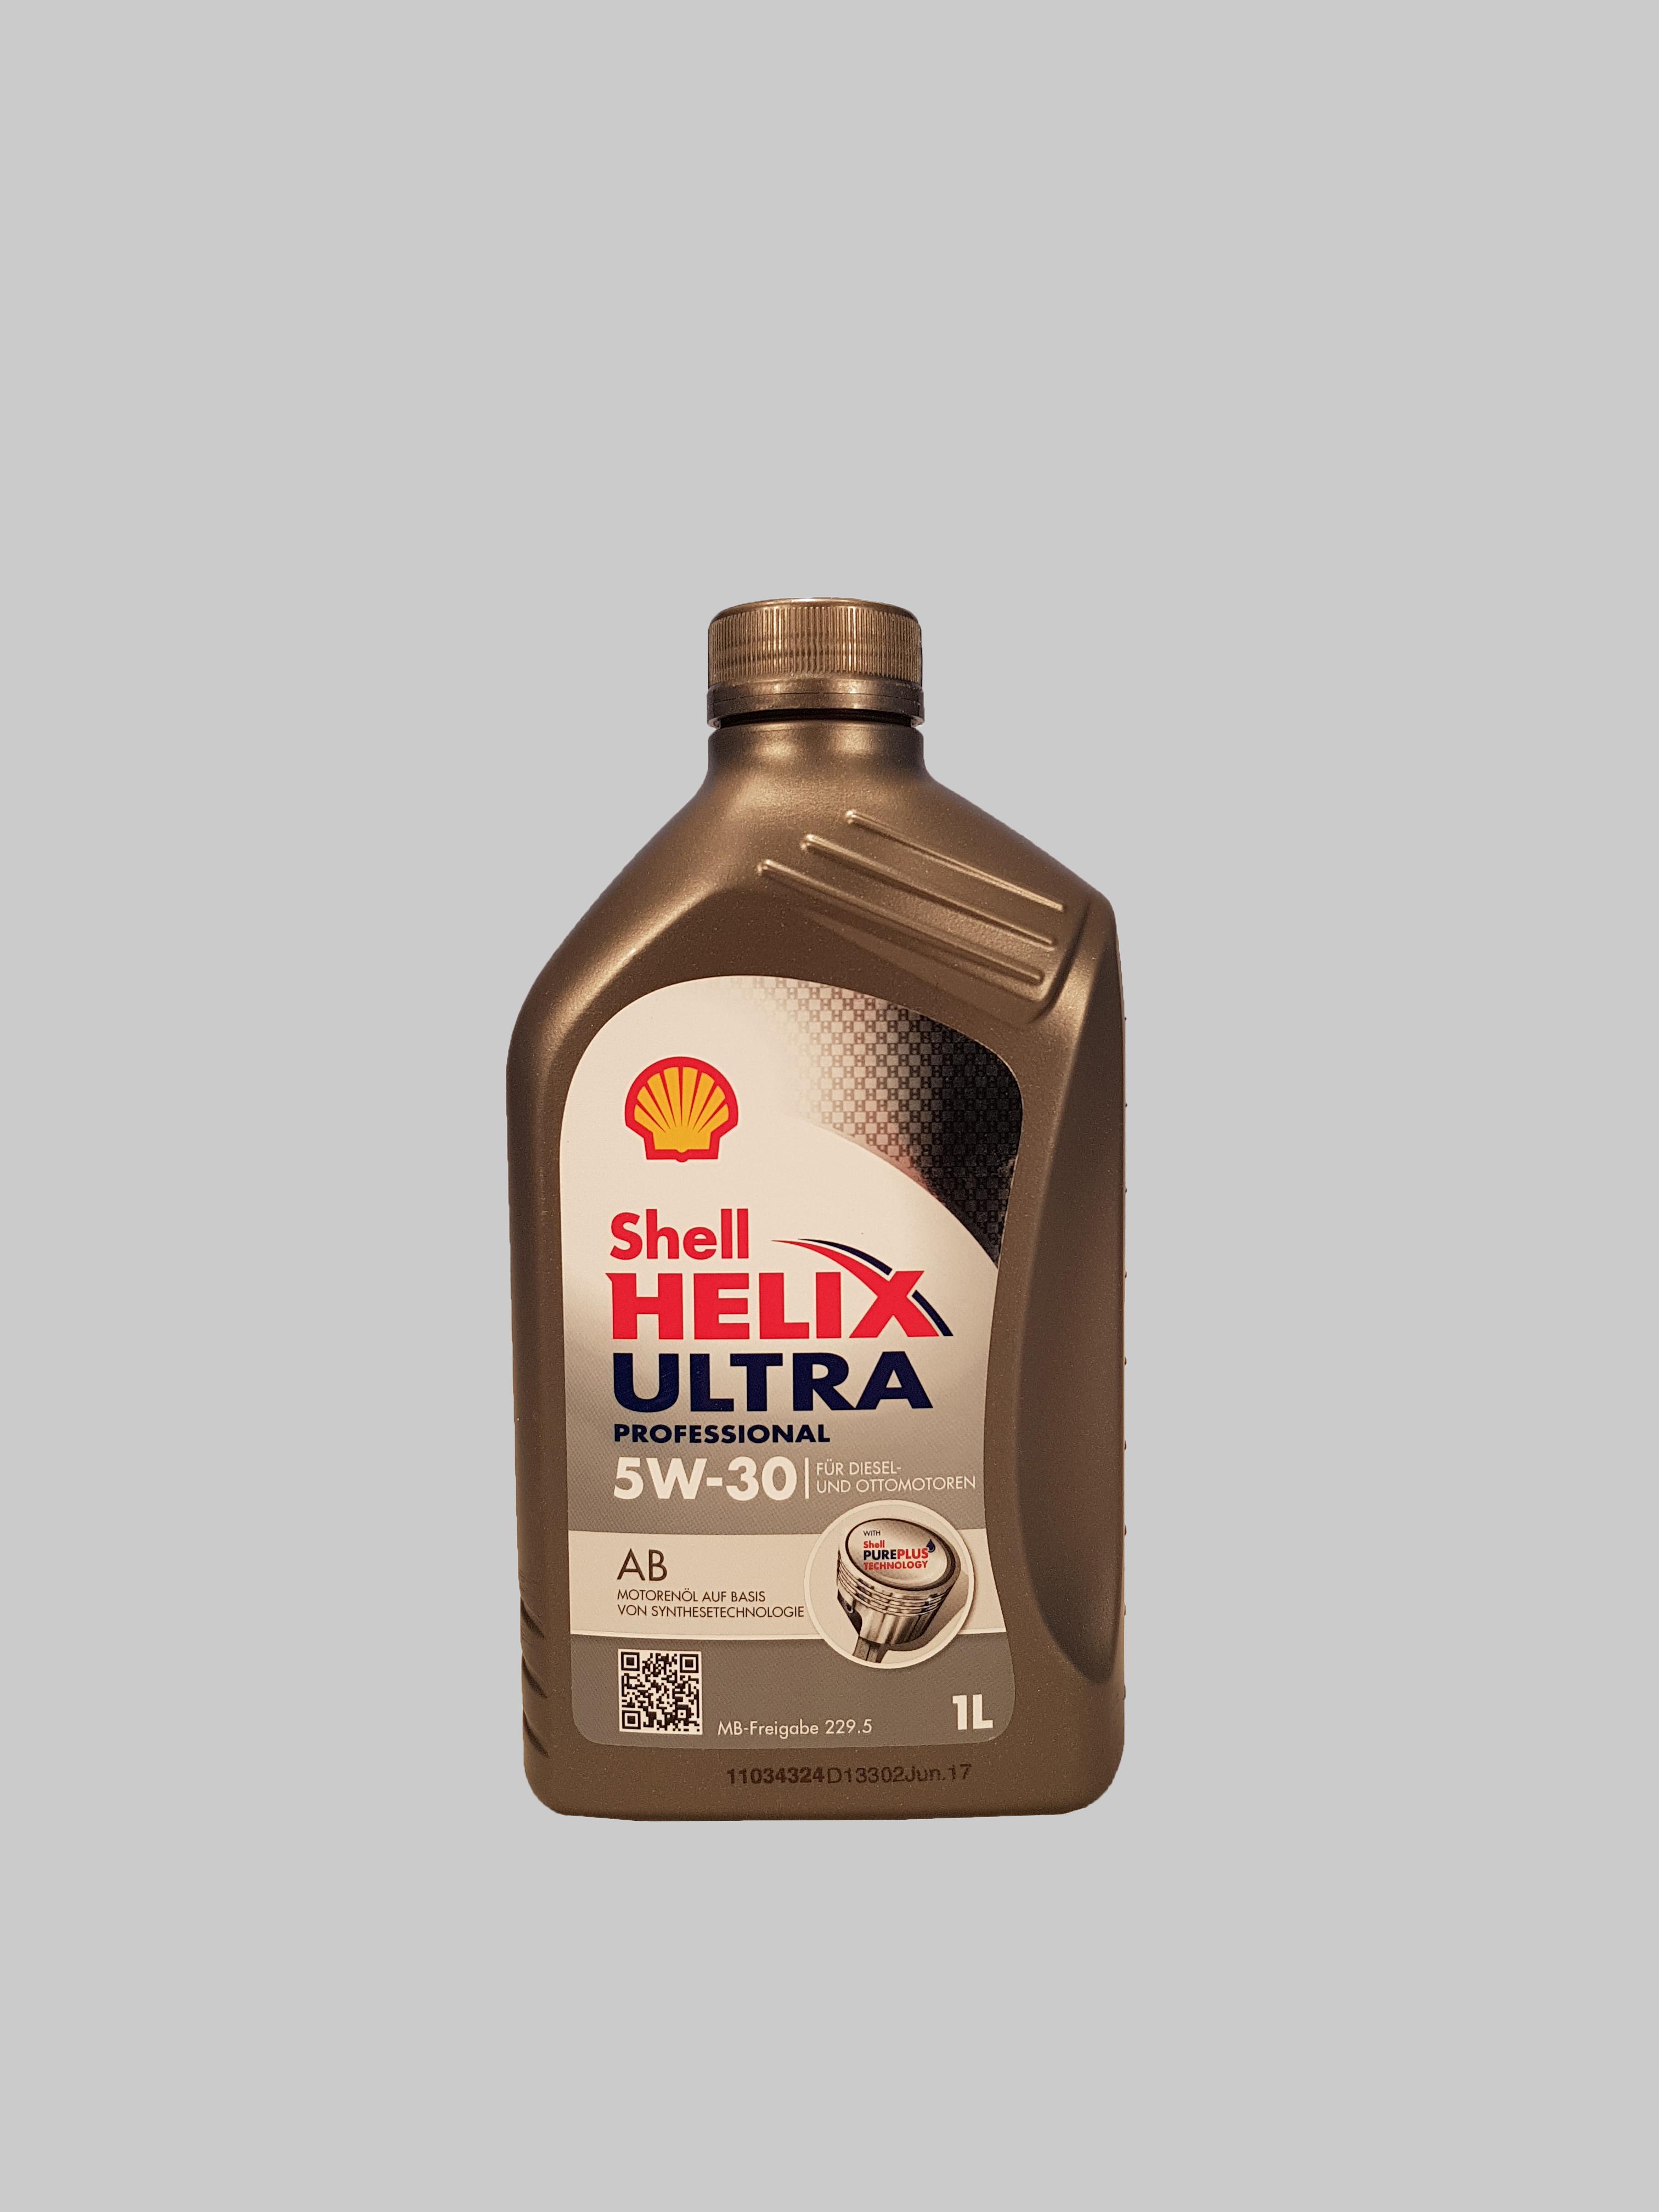 Shell Helix Ultra Professional AB 5W-30 1 Liter